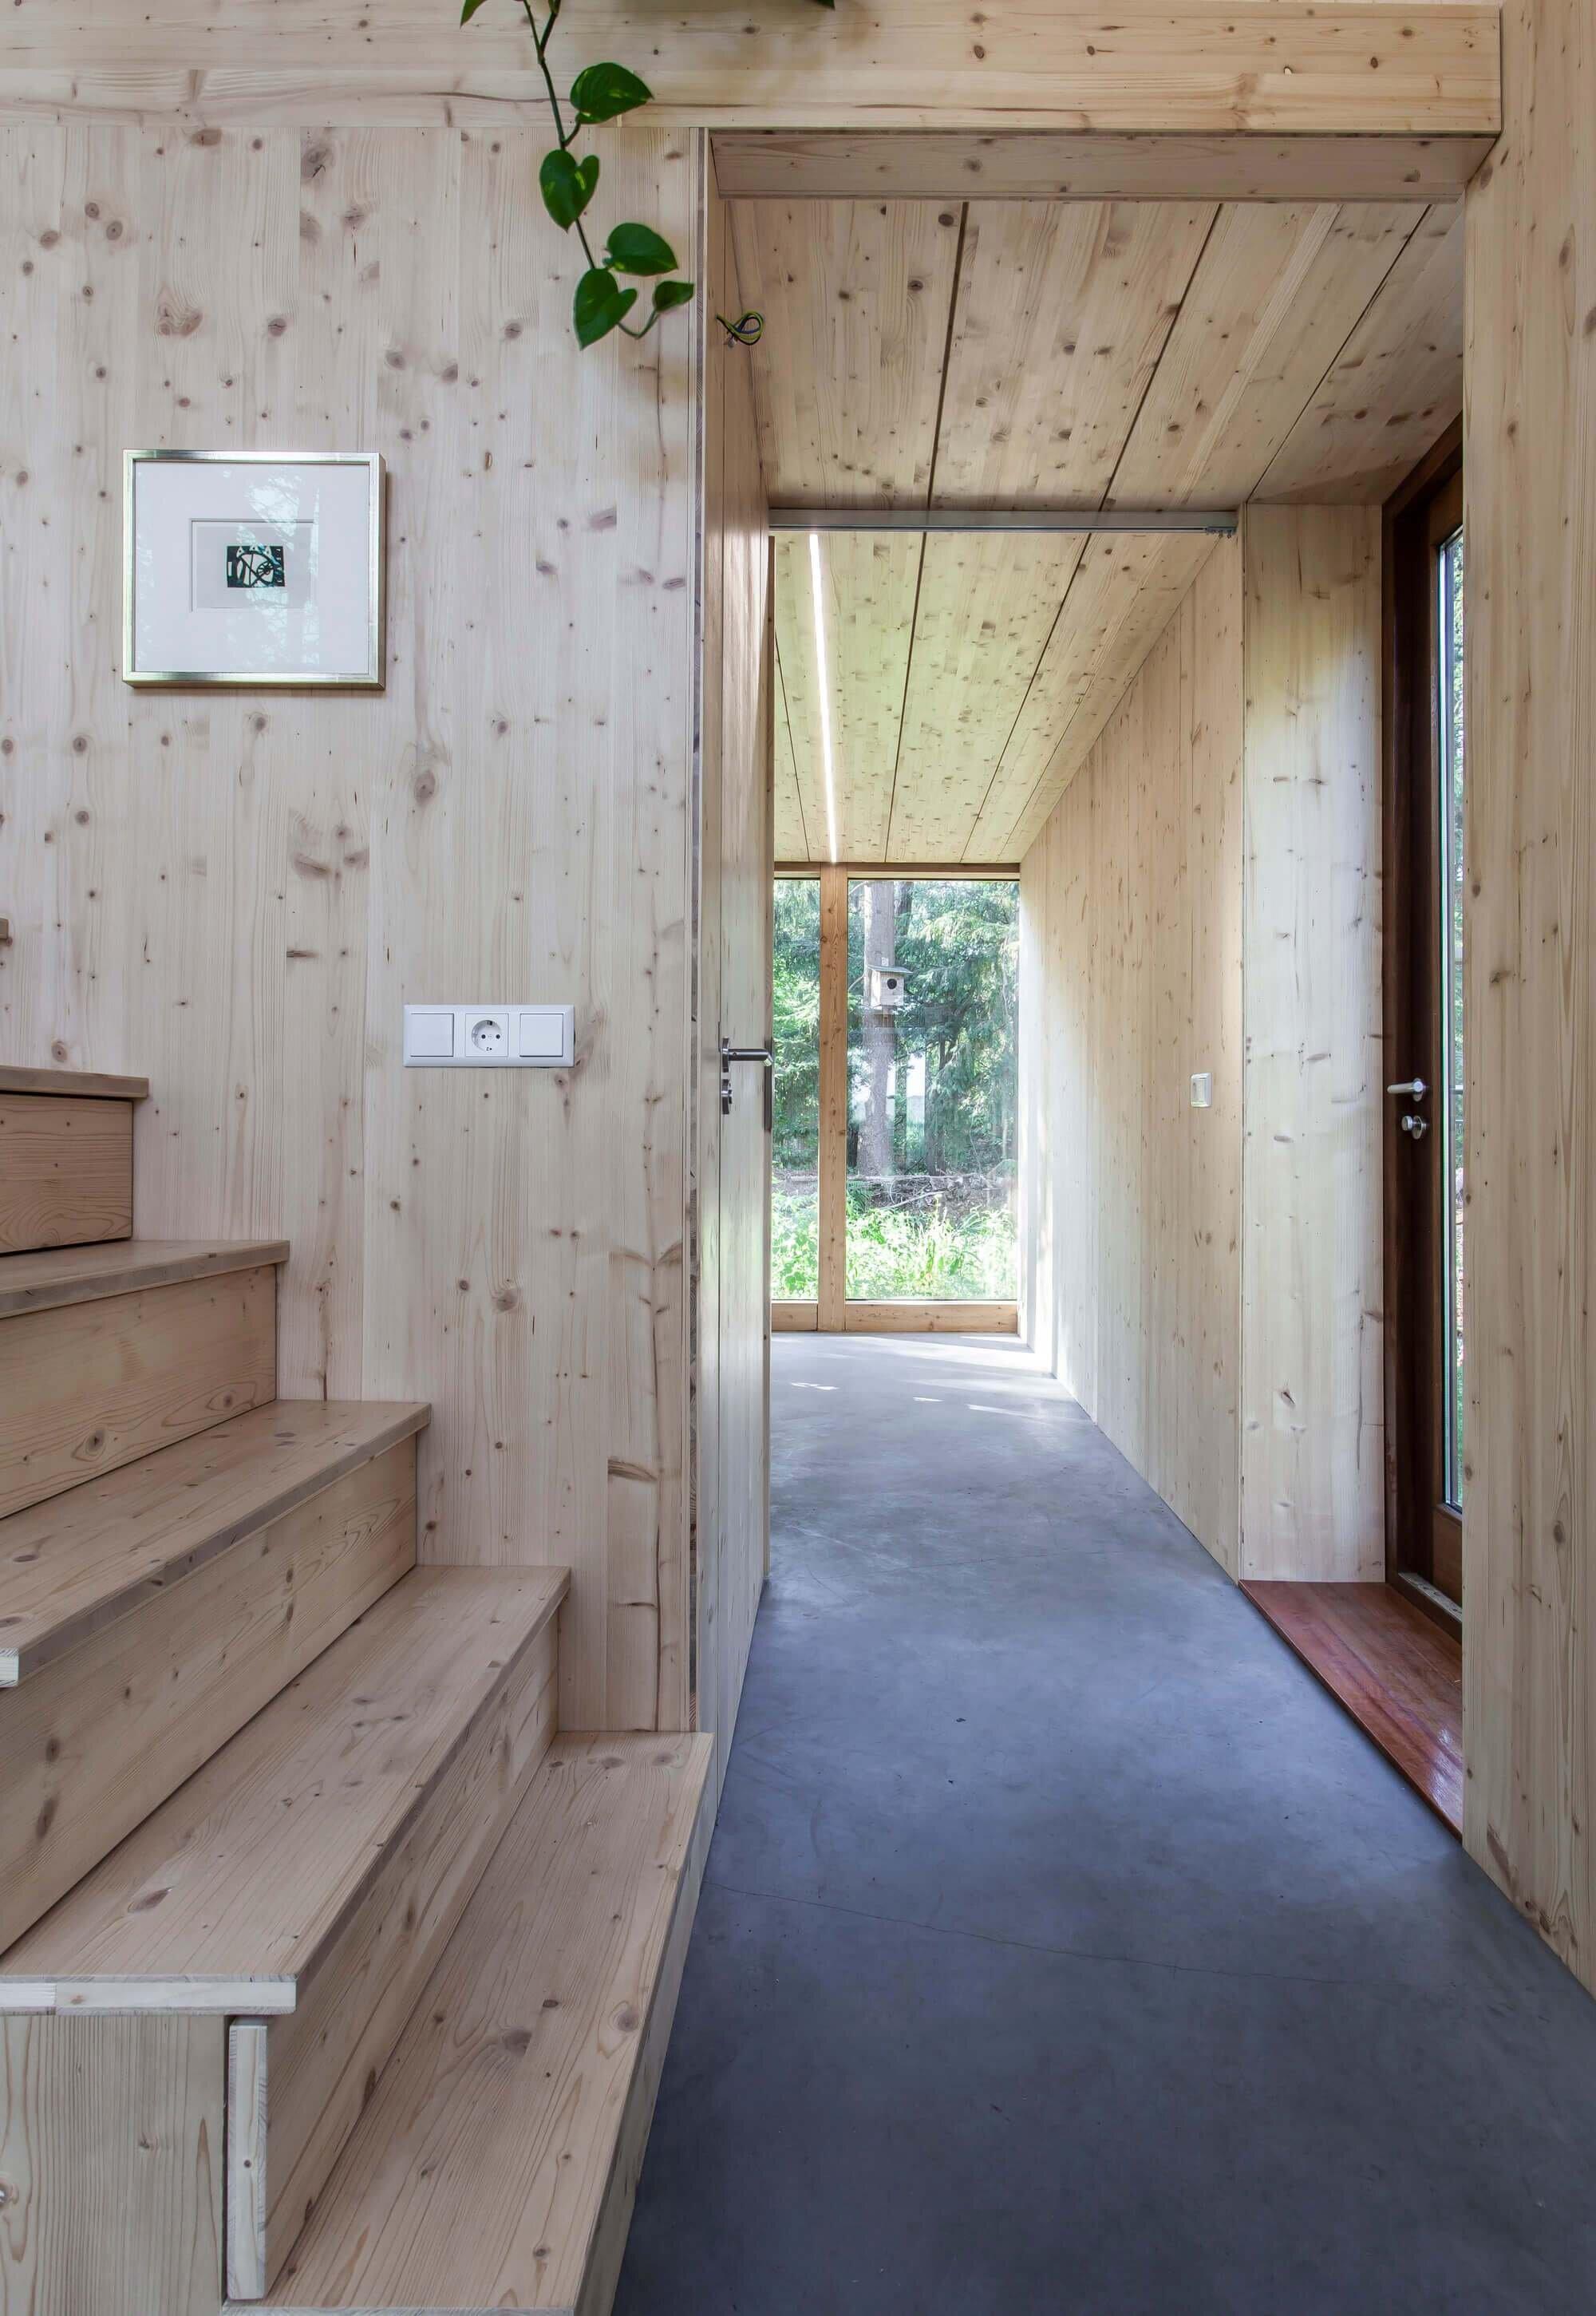 Indigo-Atelierwoning-Woonpioniers-The-Netherlands-5